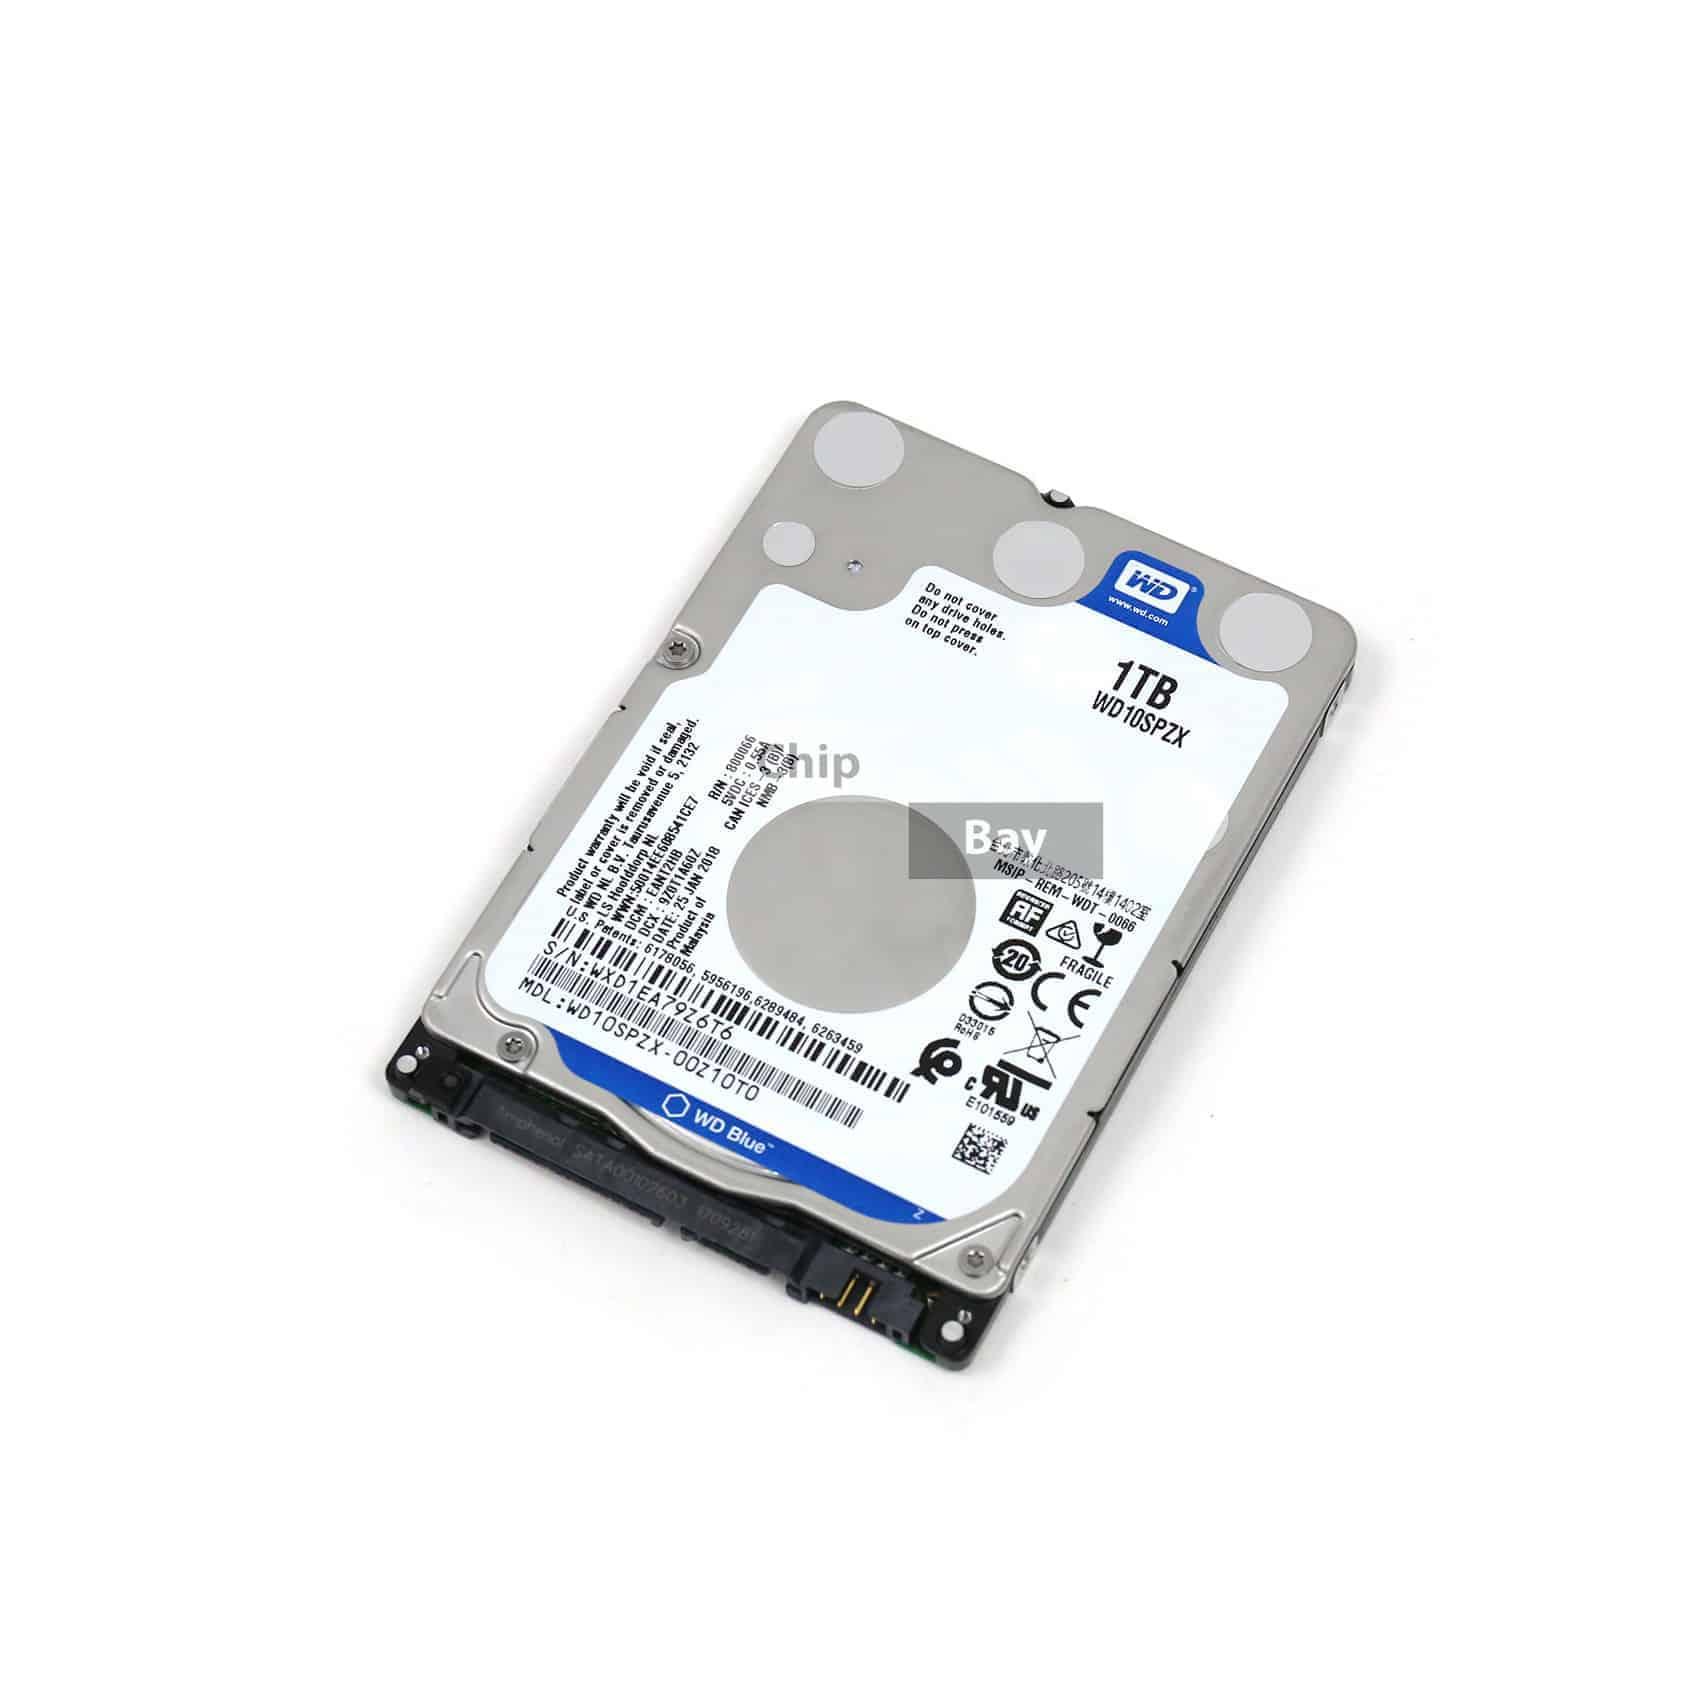 Daftar Harga Harddisk Internal Wd Update 2018 Blue 6tb Sata Pc 35inch Free Antivirus Kaspersky Pen Genuine 1tb Hard Drive Hdd 25 5400 Rpm Iii Wd10spzx